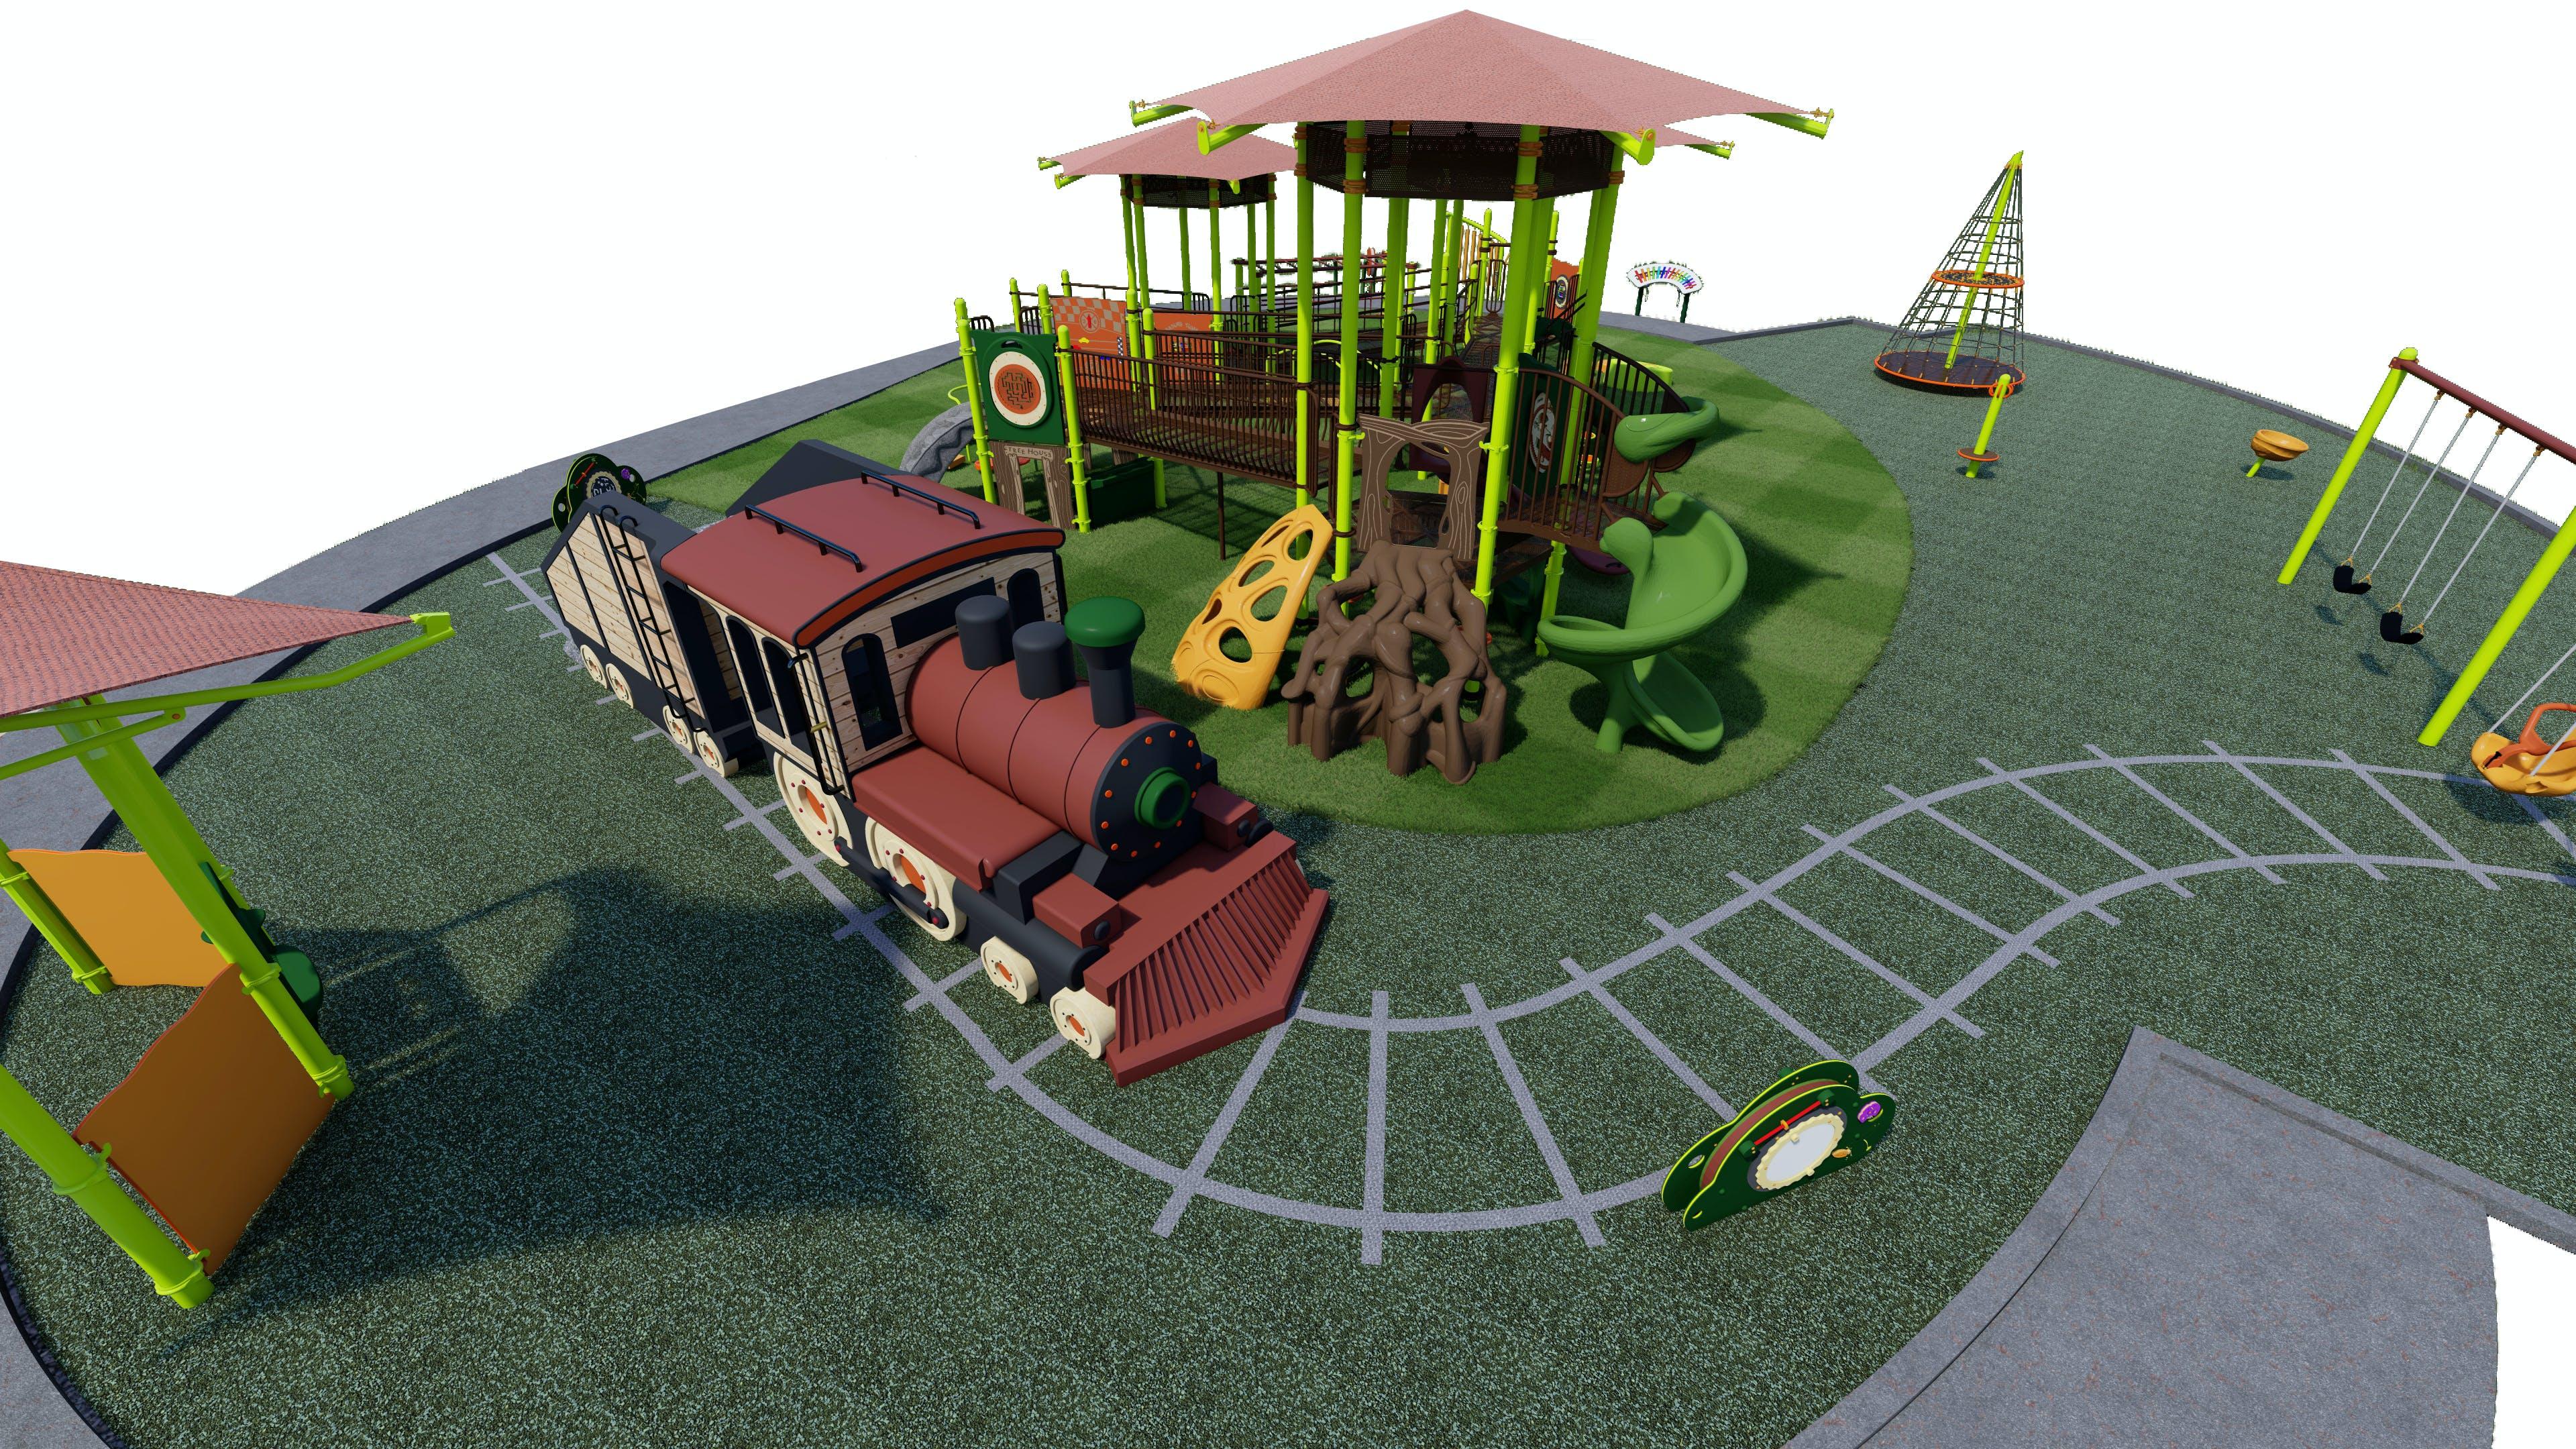 Preferred Playground Design View 3